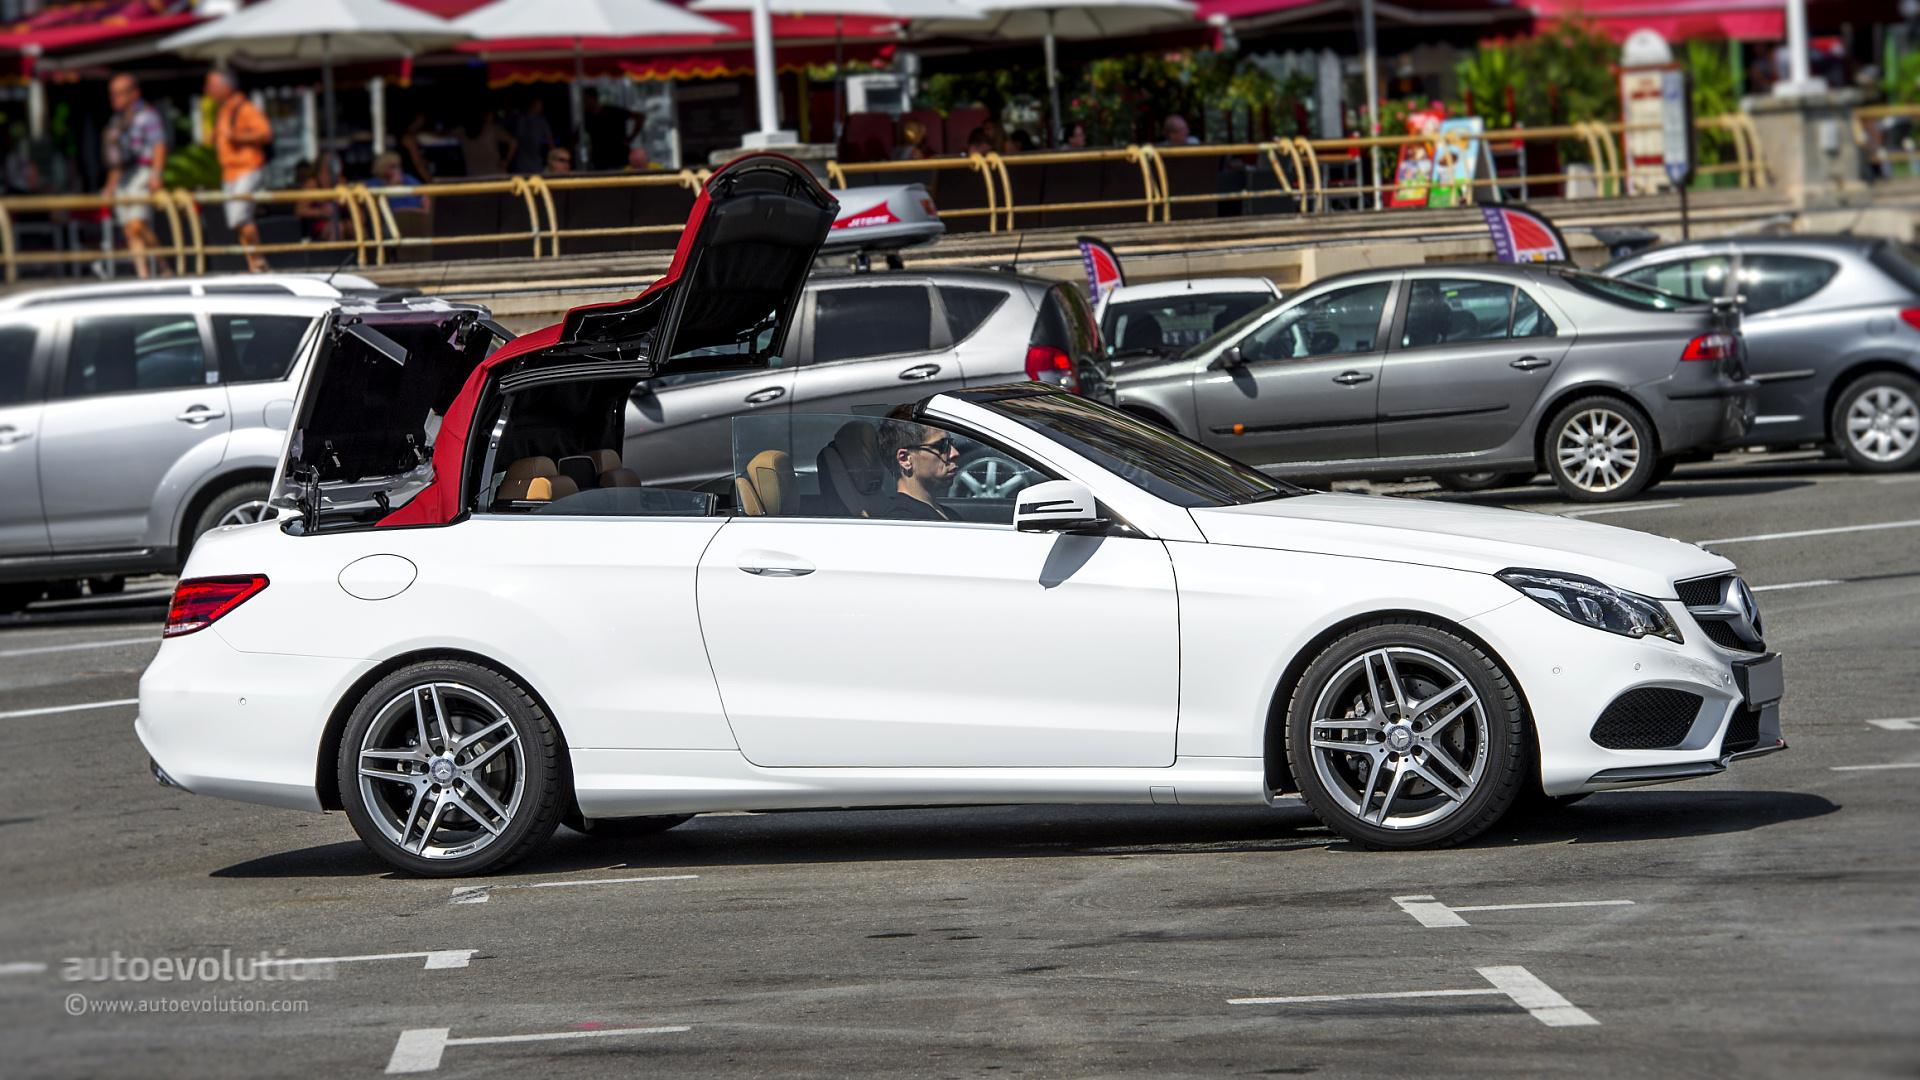 2014 mercedes benz e class cabriolet review autoevolution for Mercedes benz e350 convertible for sale